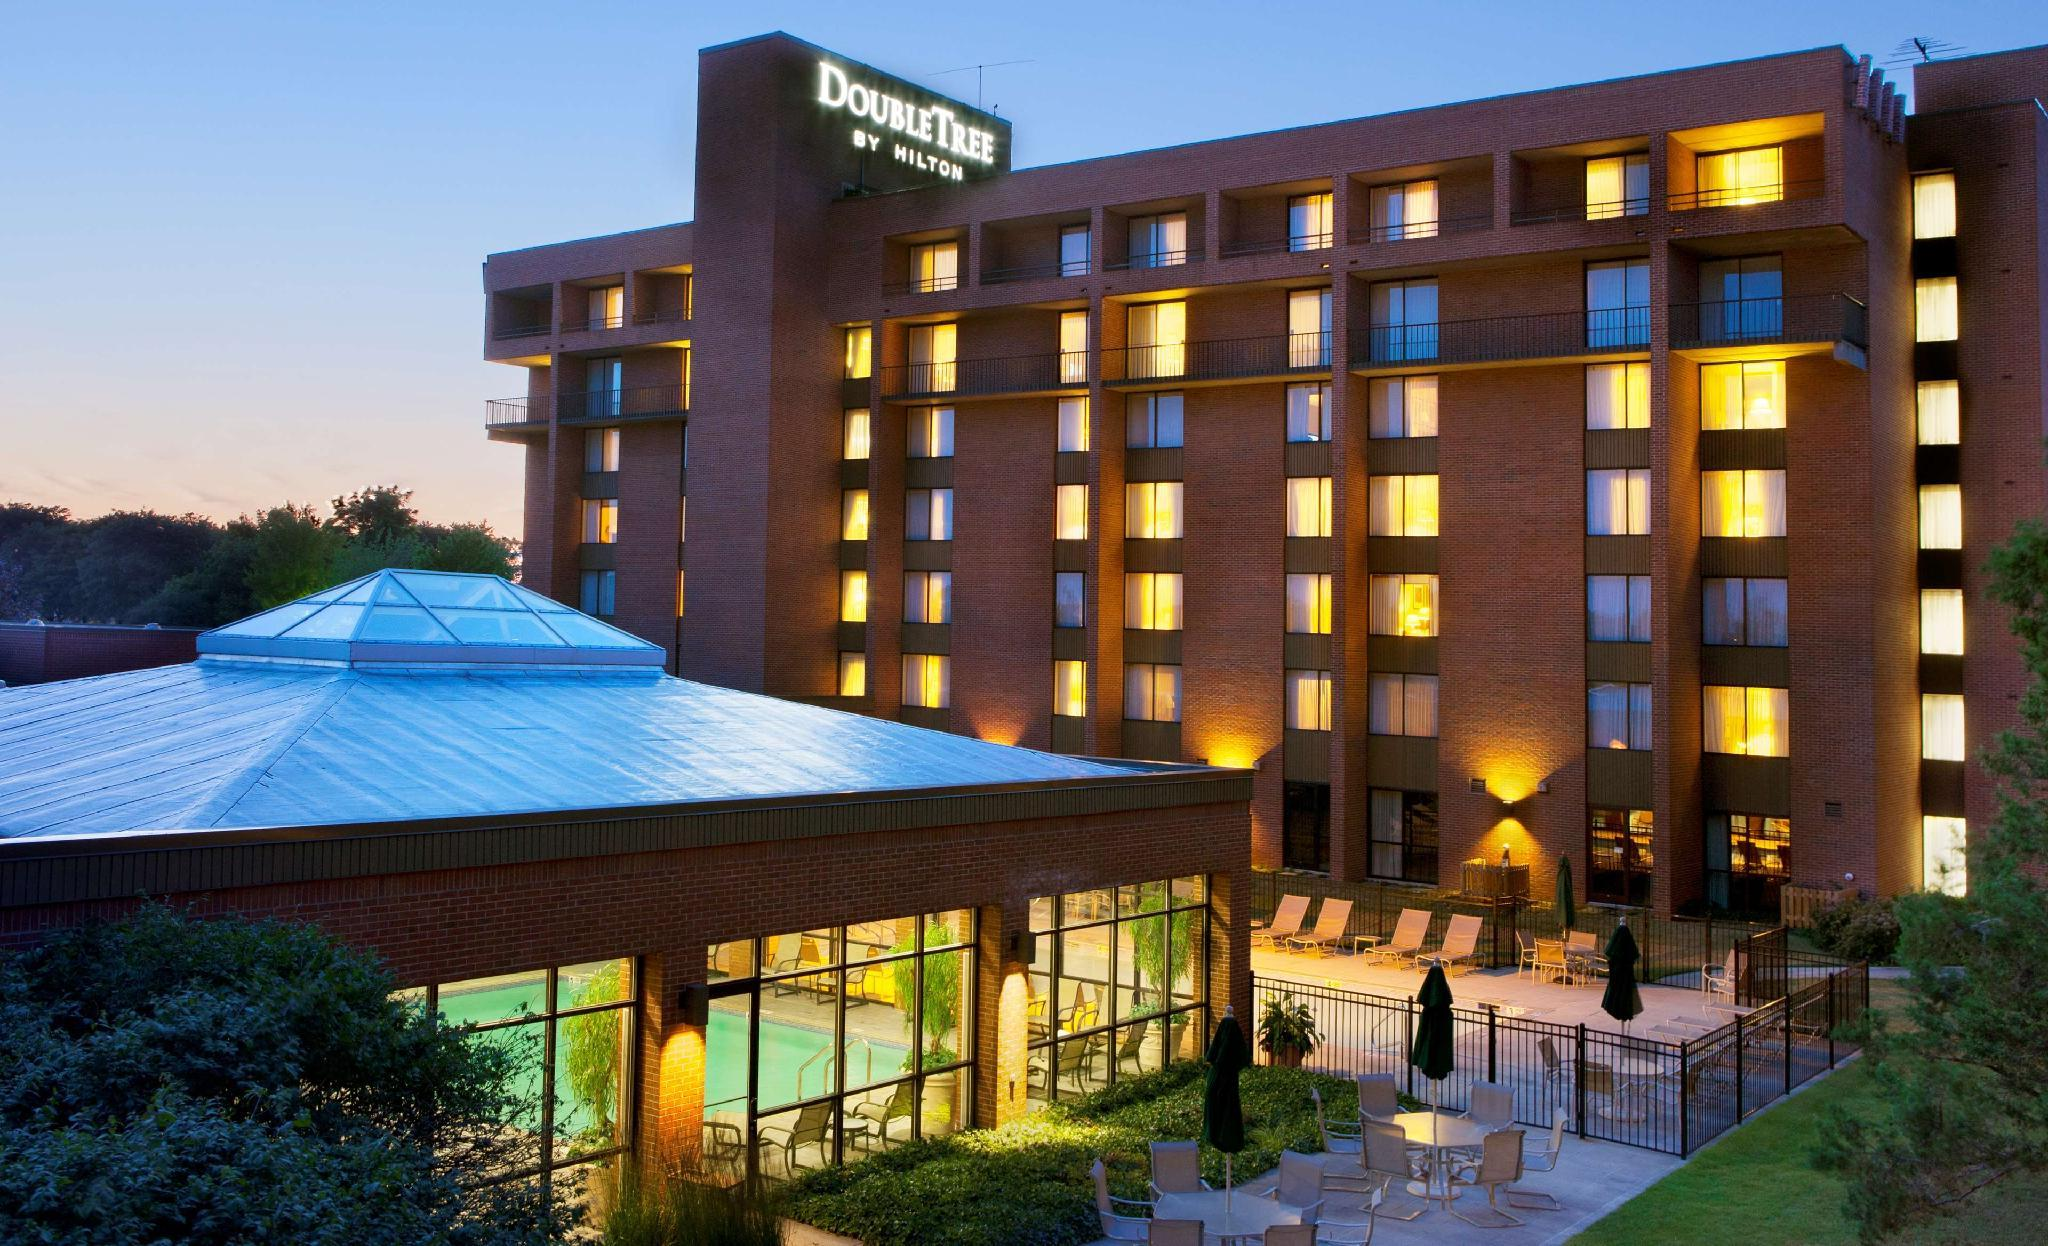 Doubletree Hotel Syracuse